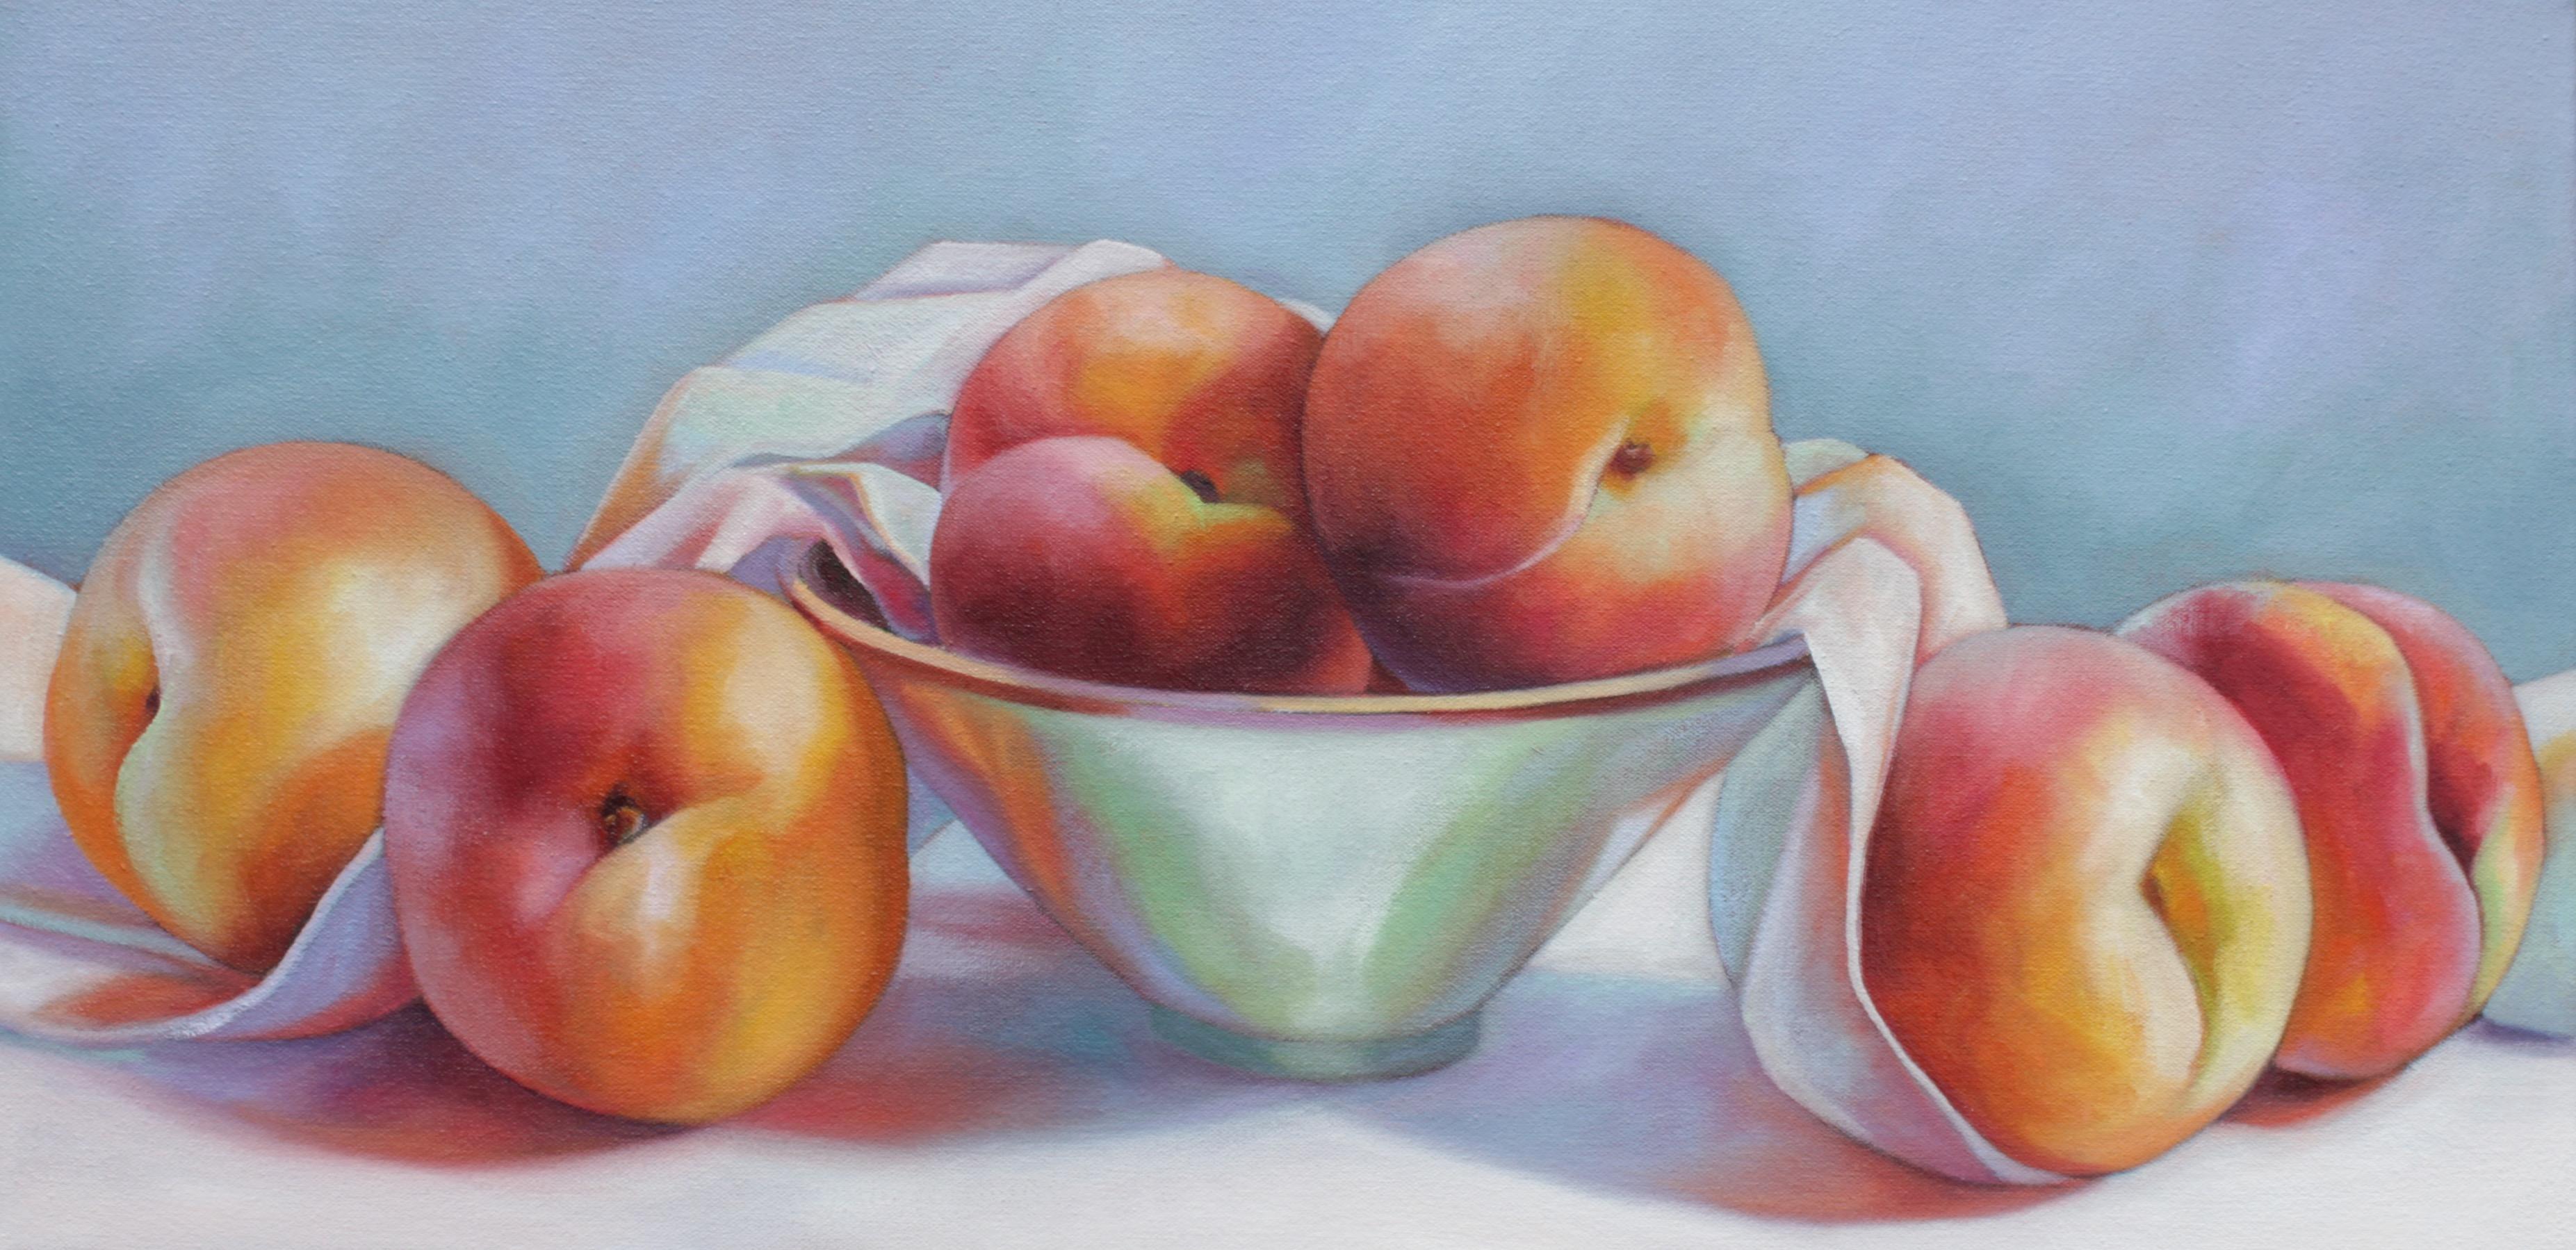 Peaches in Their Place